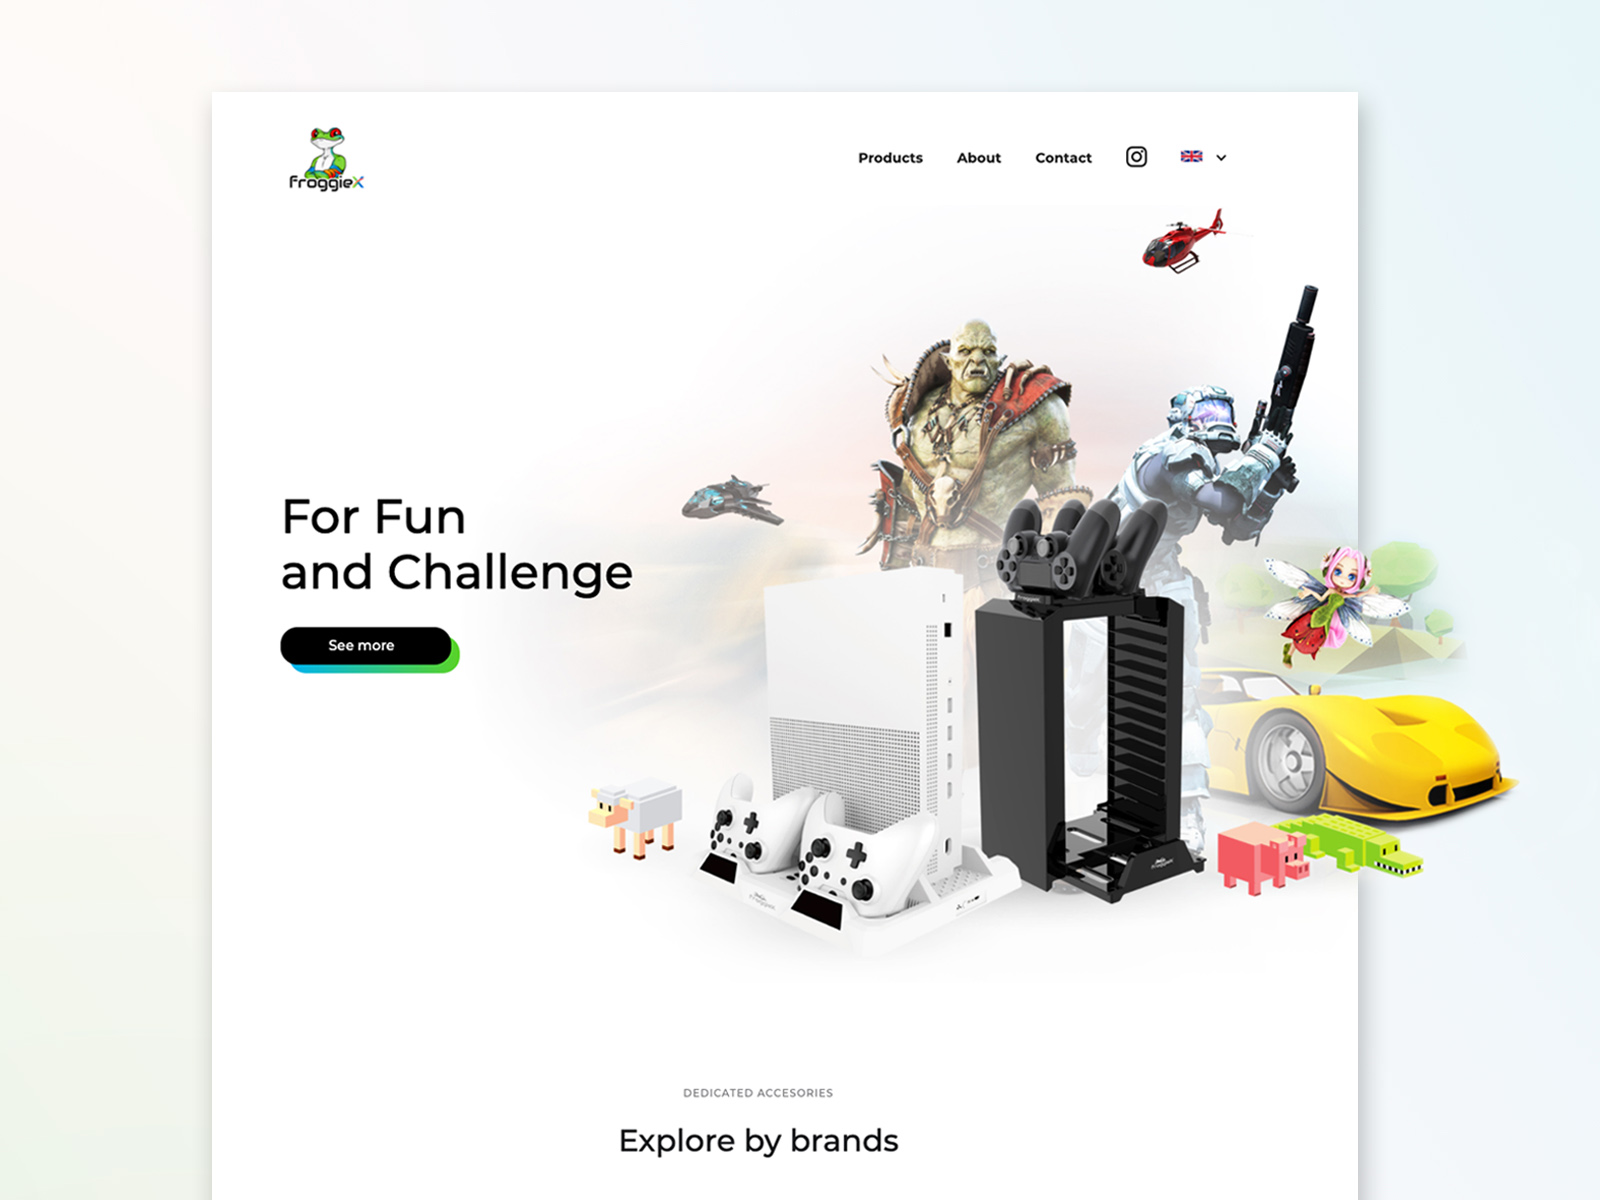 FroggieX website